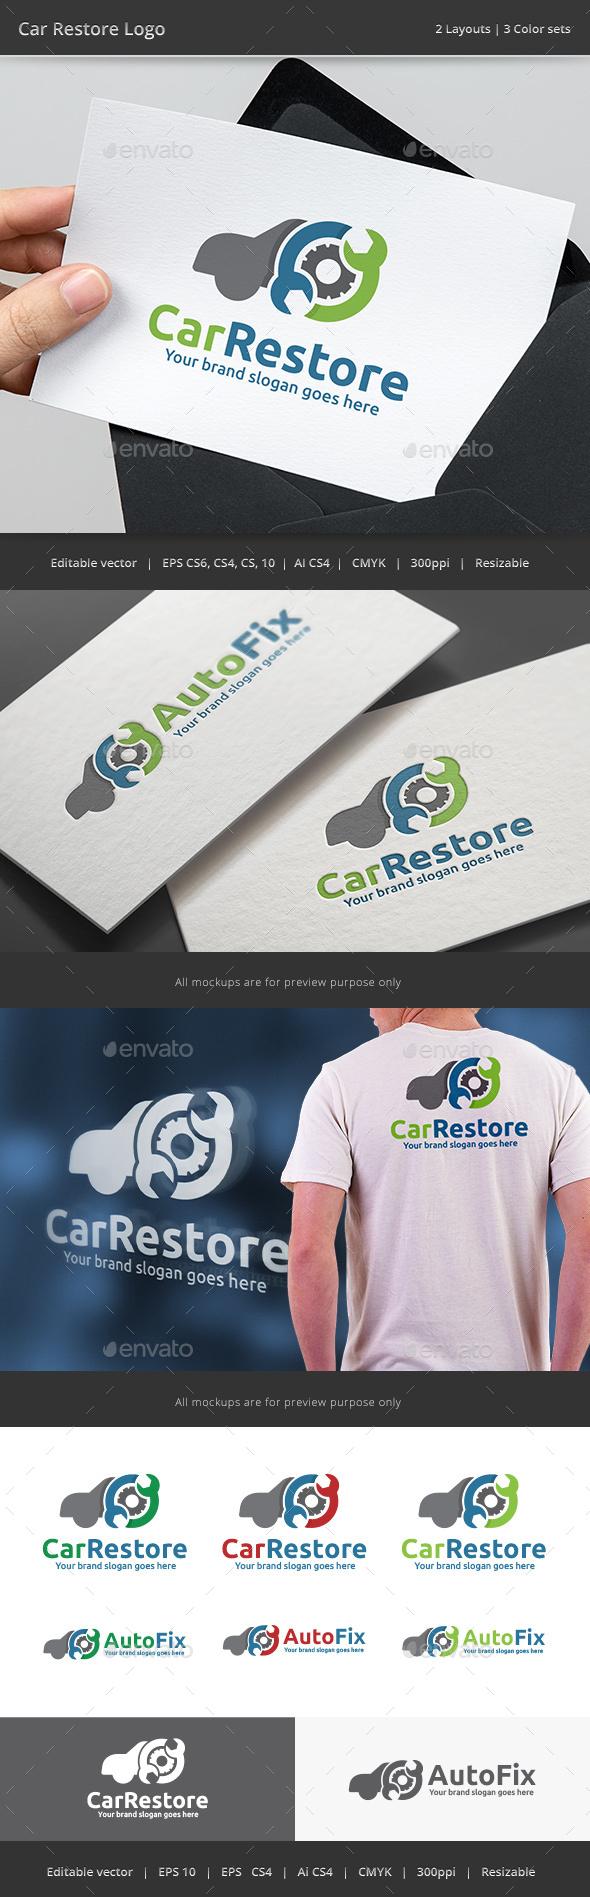 Car Restore Garage Logo - Vector Abstract